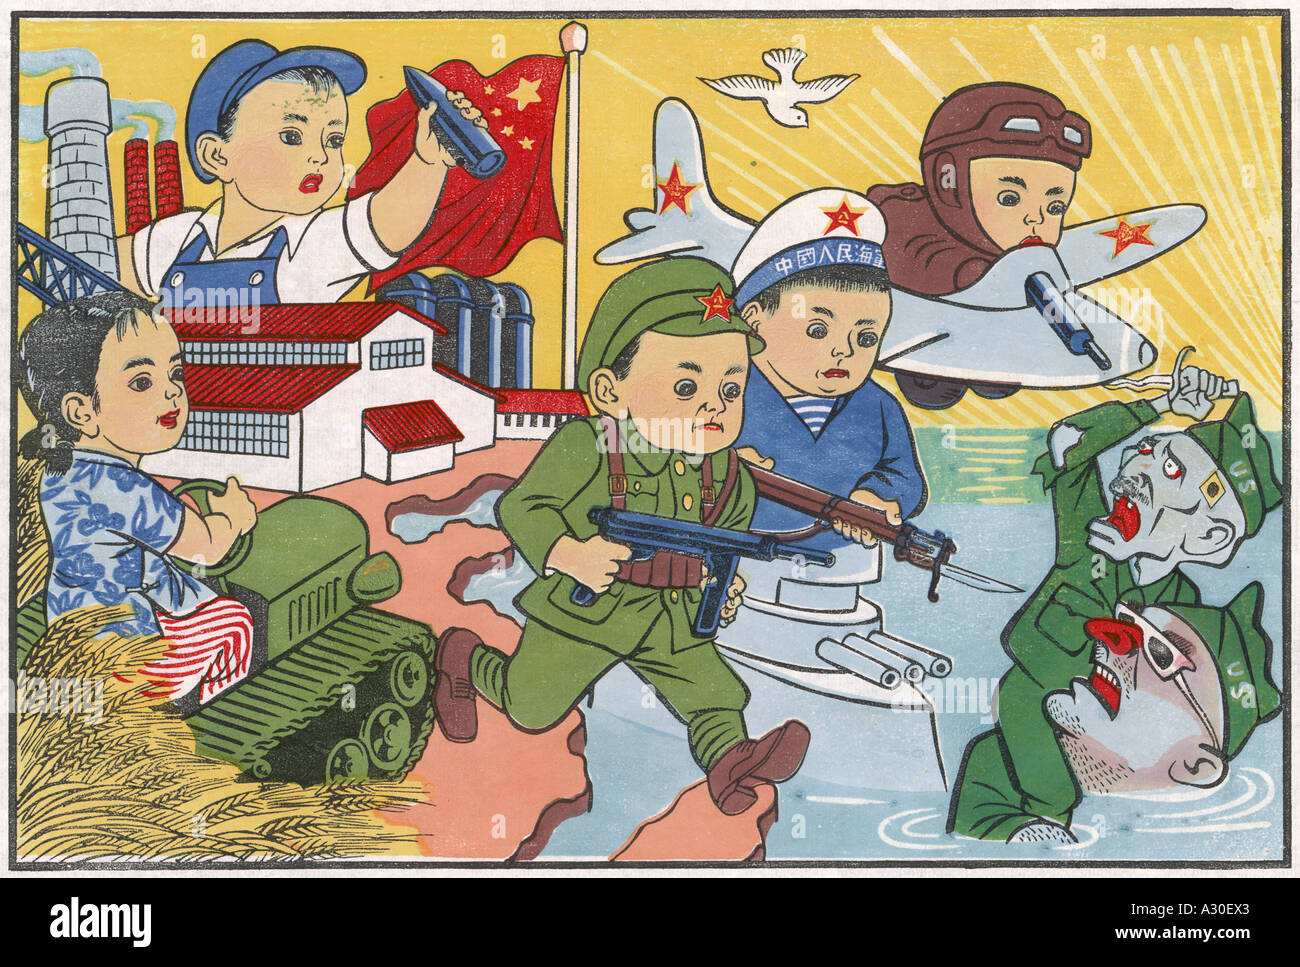 China Yankee Imperialist - Stock Image